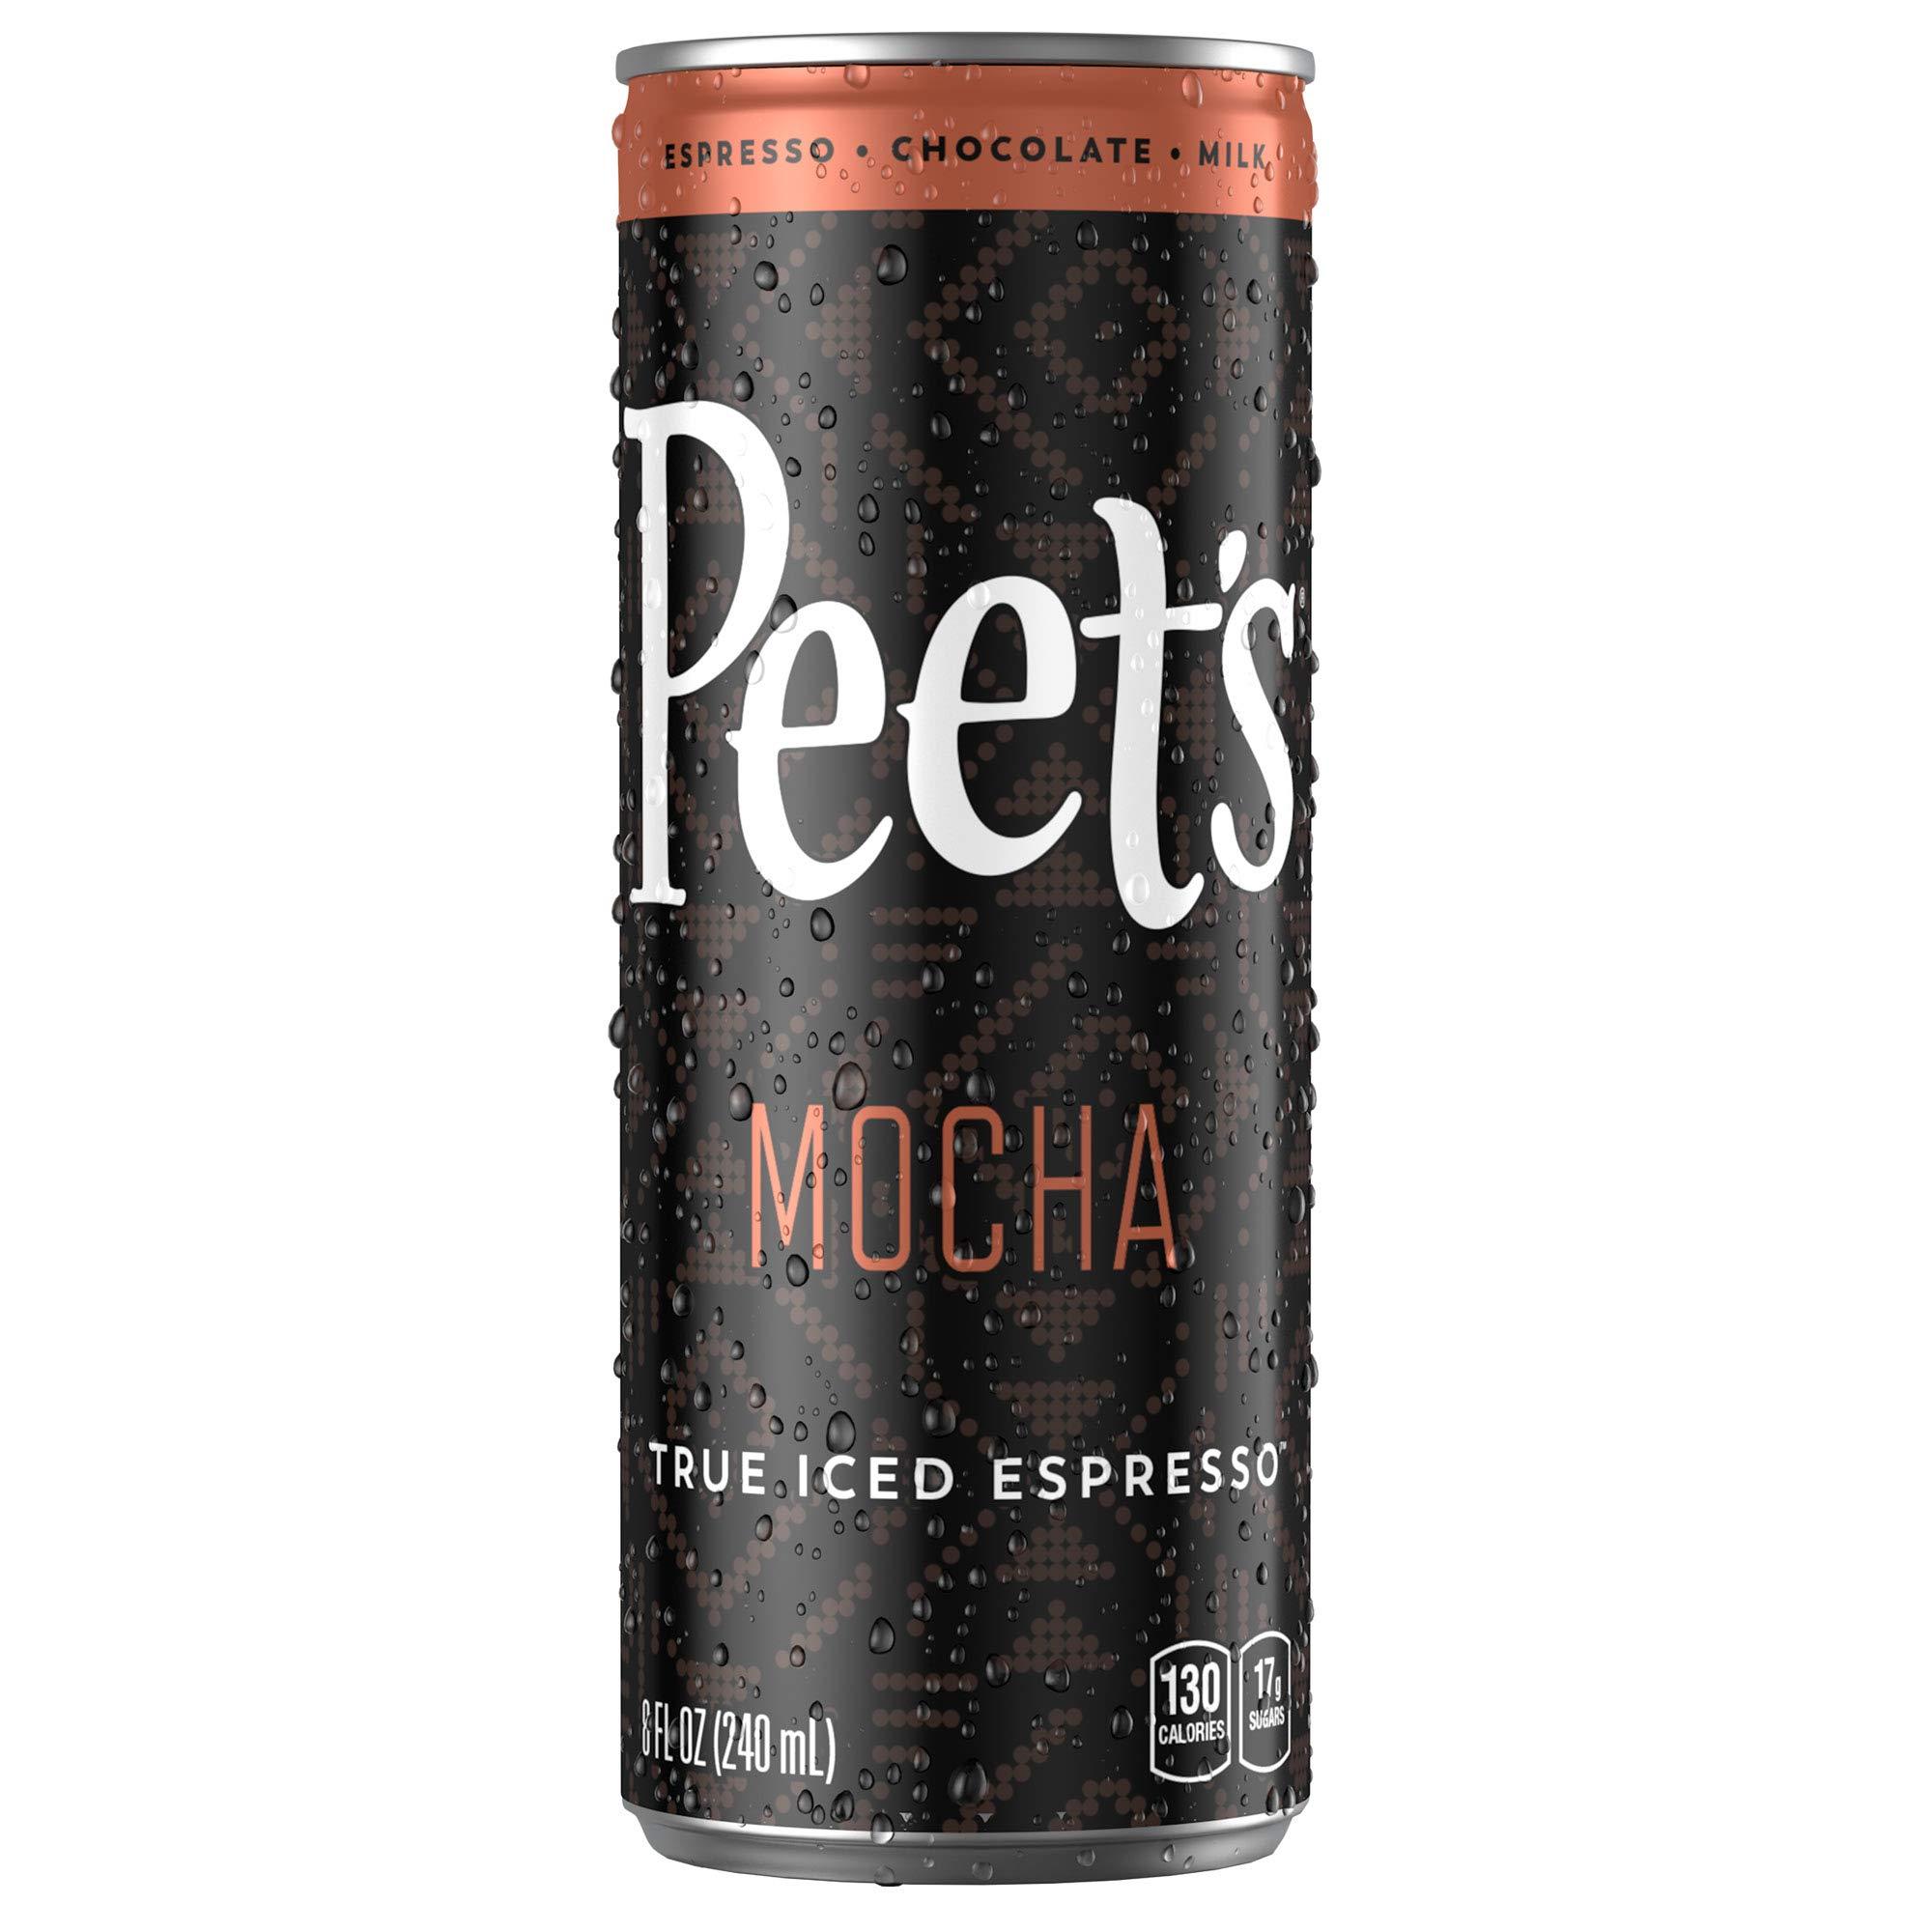 Peet's Iced Espresso Mocha Chocolate 8 oz Can (12 Count) Single-Origin Colombian Espresso with Dutch Process Cocoa & Milk 110 Calorie 17 grams of sugar by Peet's Coffee (Image #3)